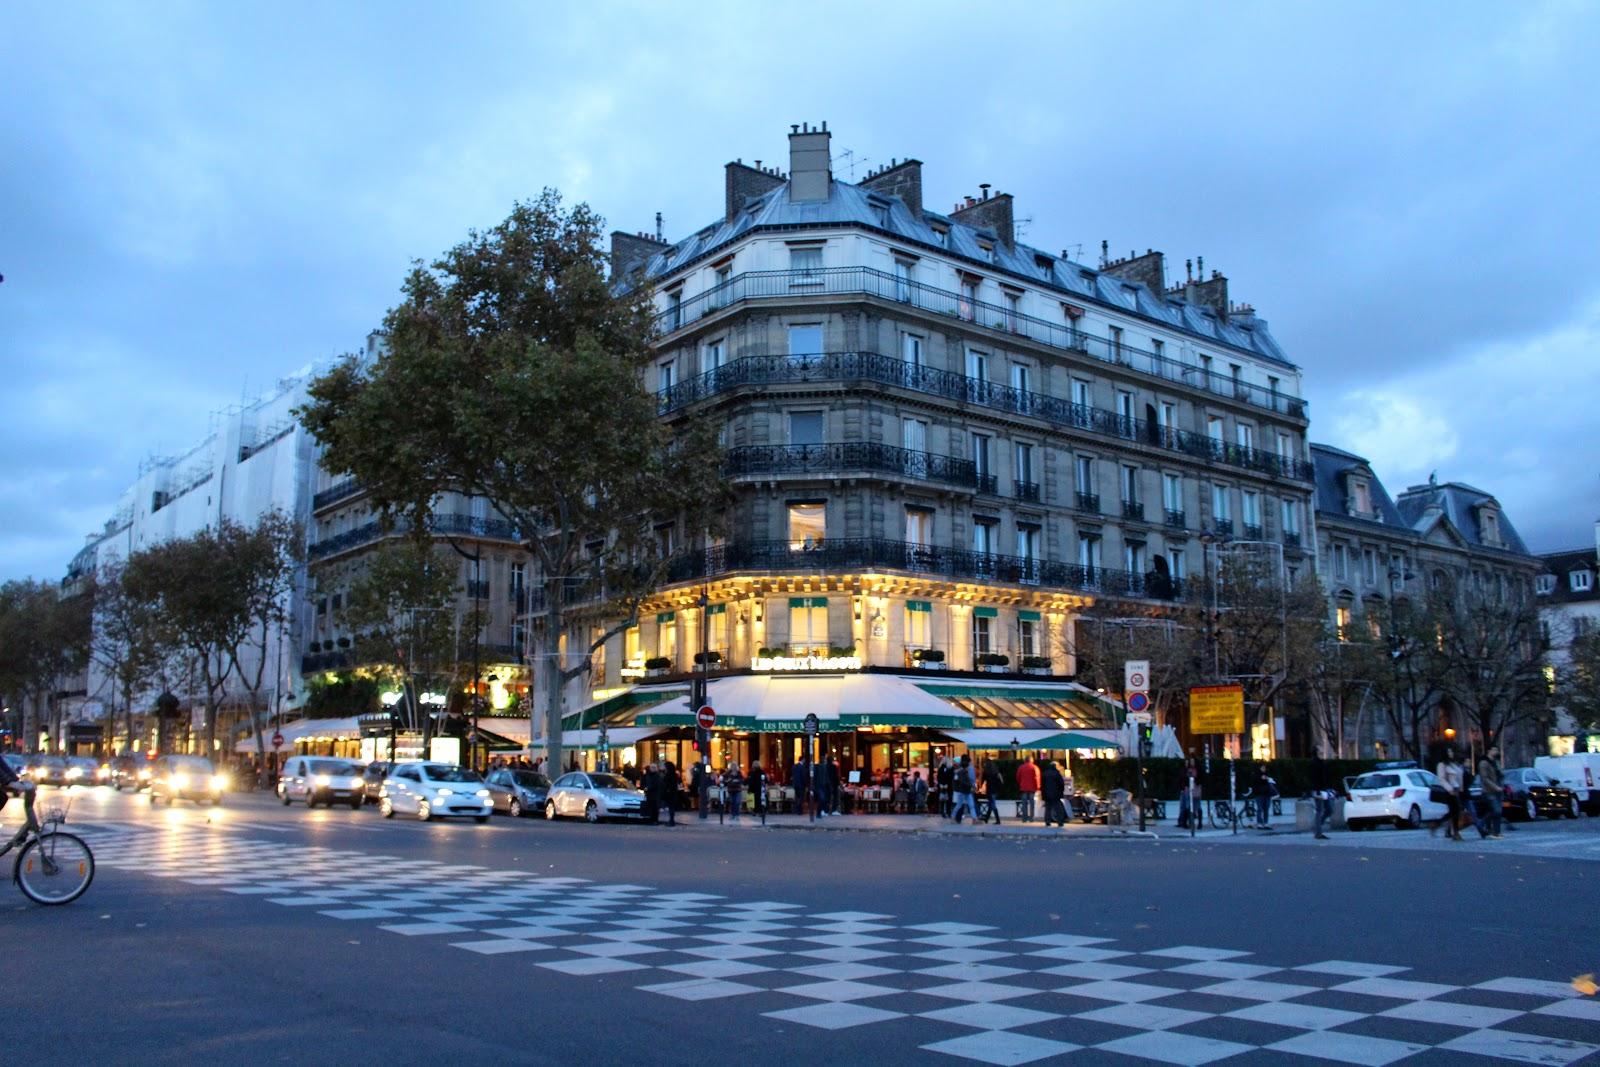 Paris November 13th 2015